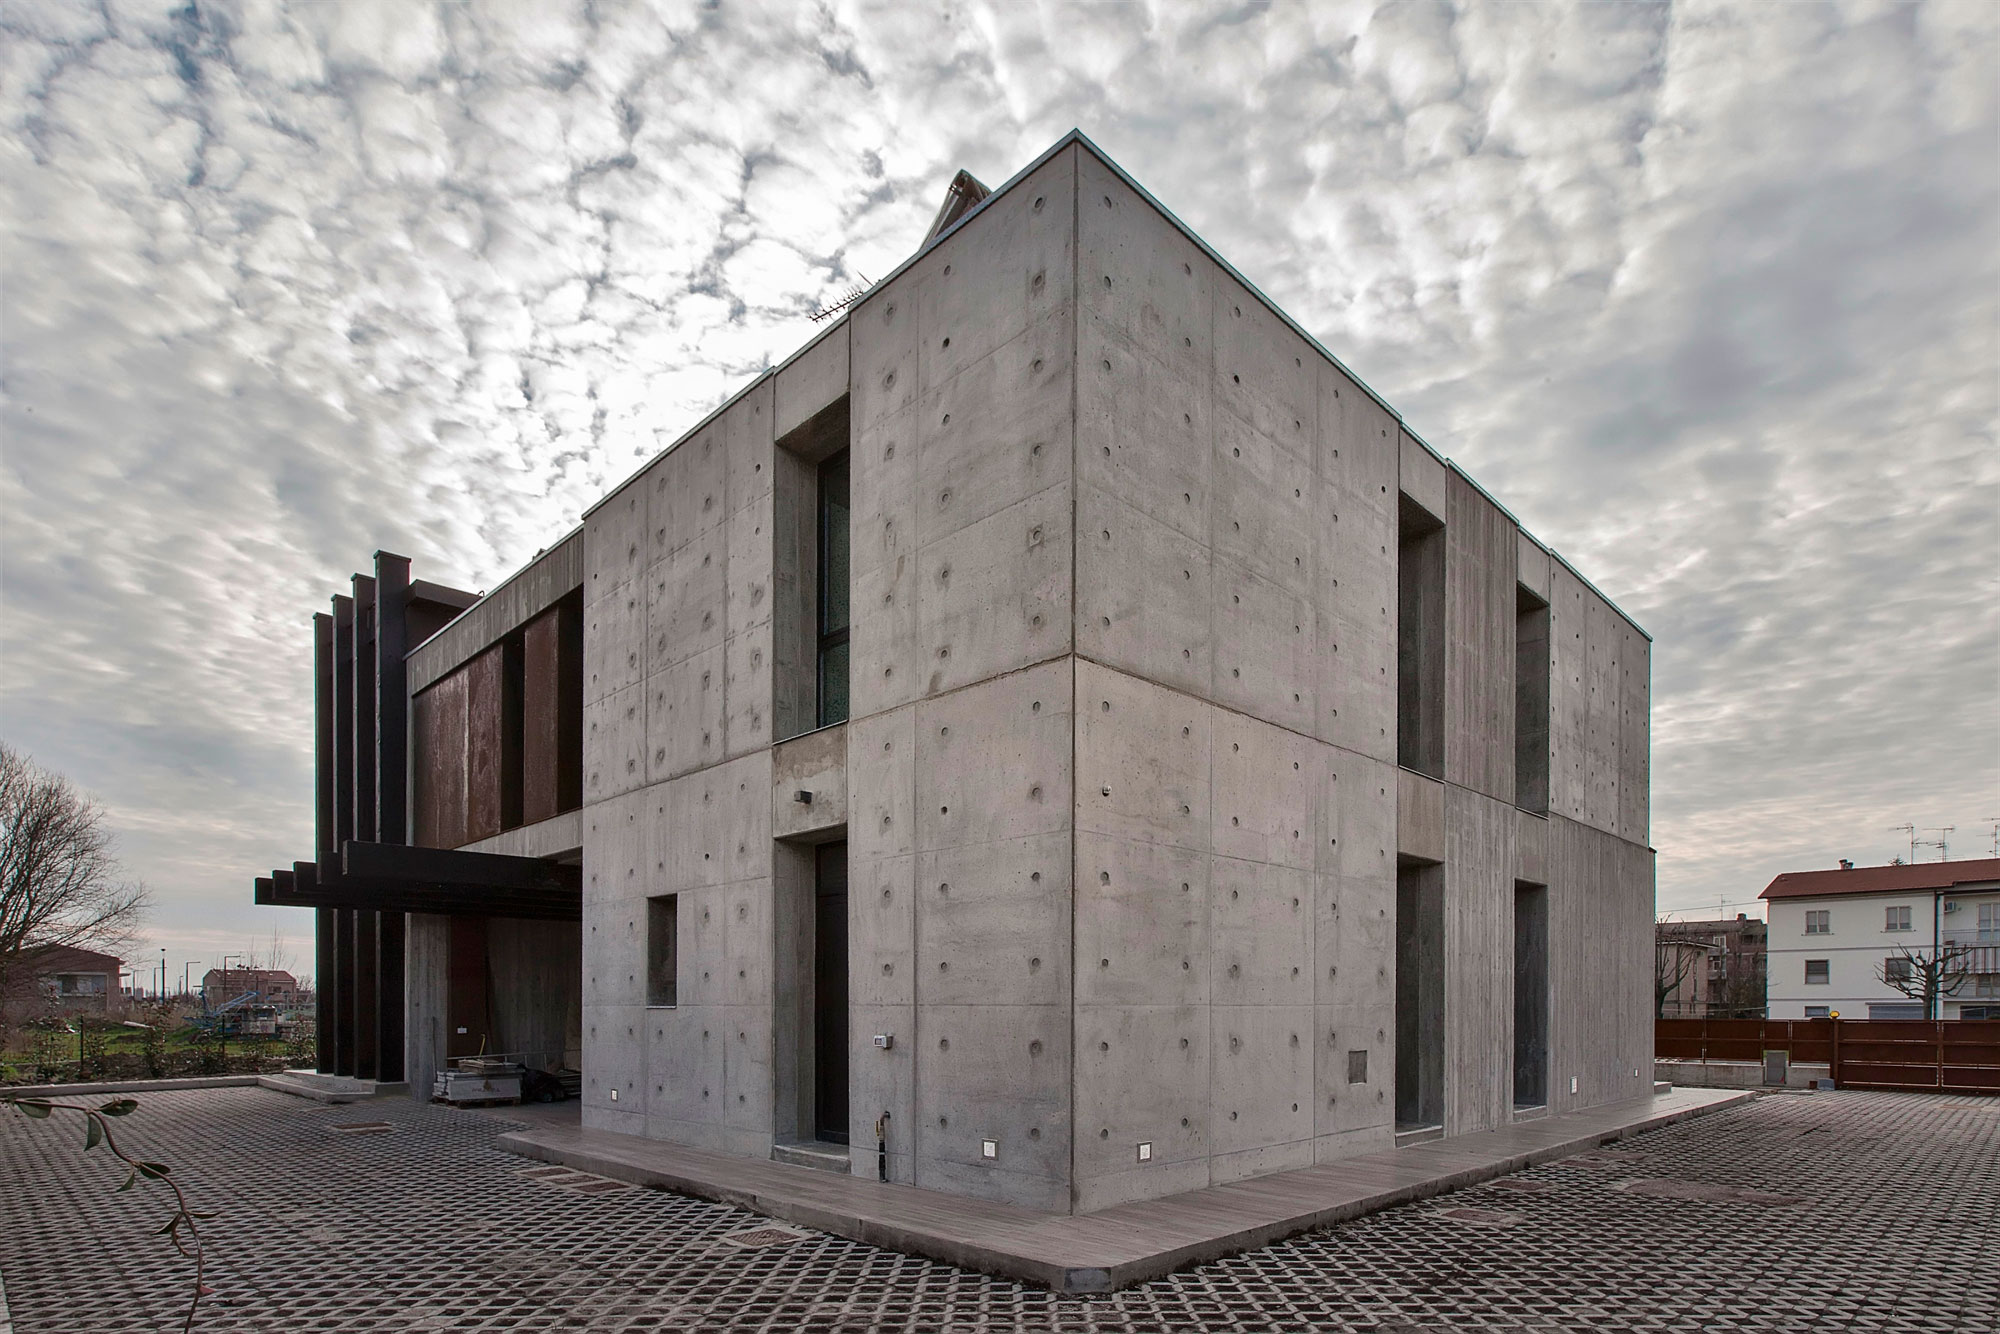 D'Autore Residence near Bologna by Giraldi Associati Architetti-02